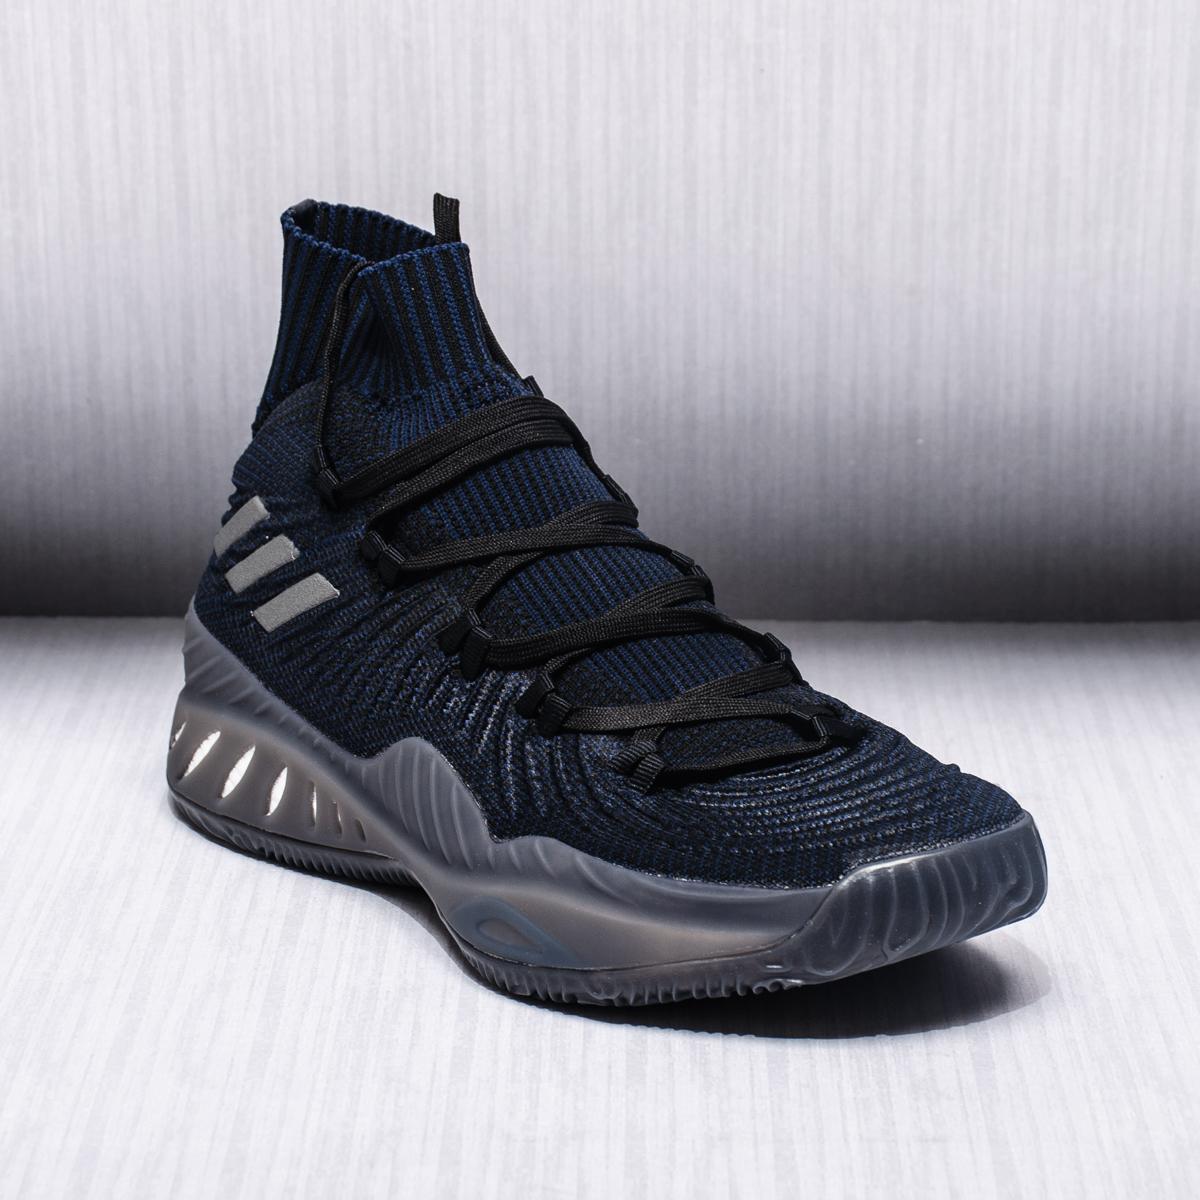 adidas adidas adidas Crazy Explosive 2017 Primeknit BASKETBALL SHOES Adidas 2a0124